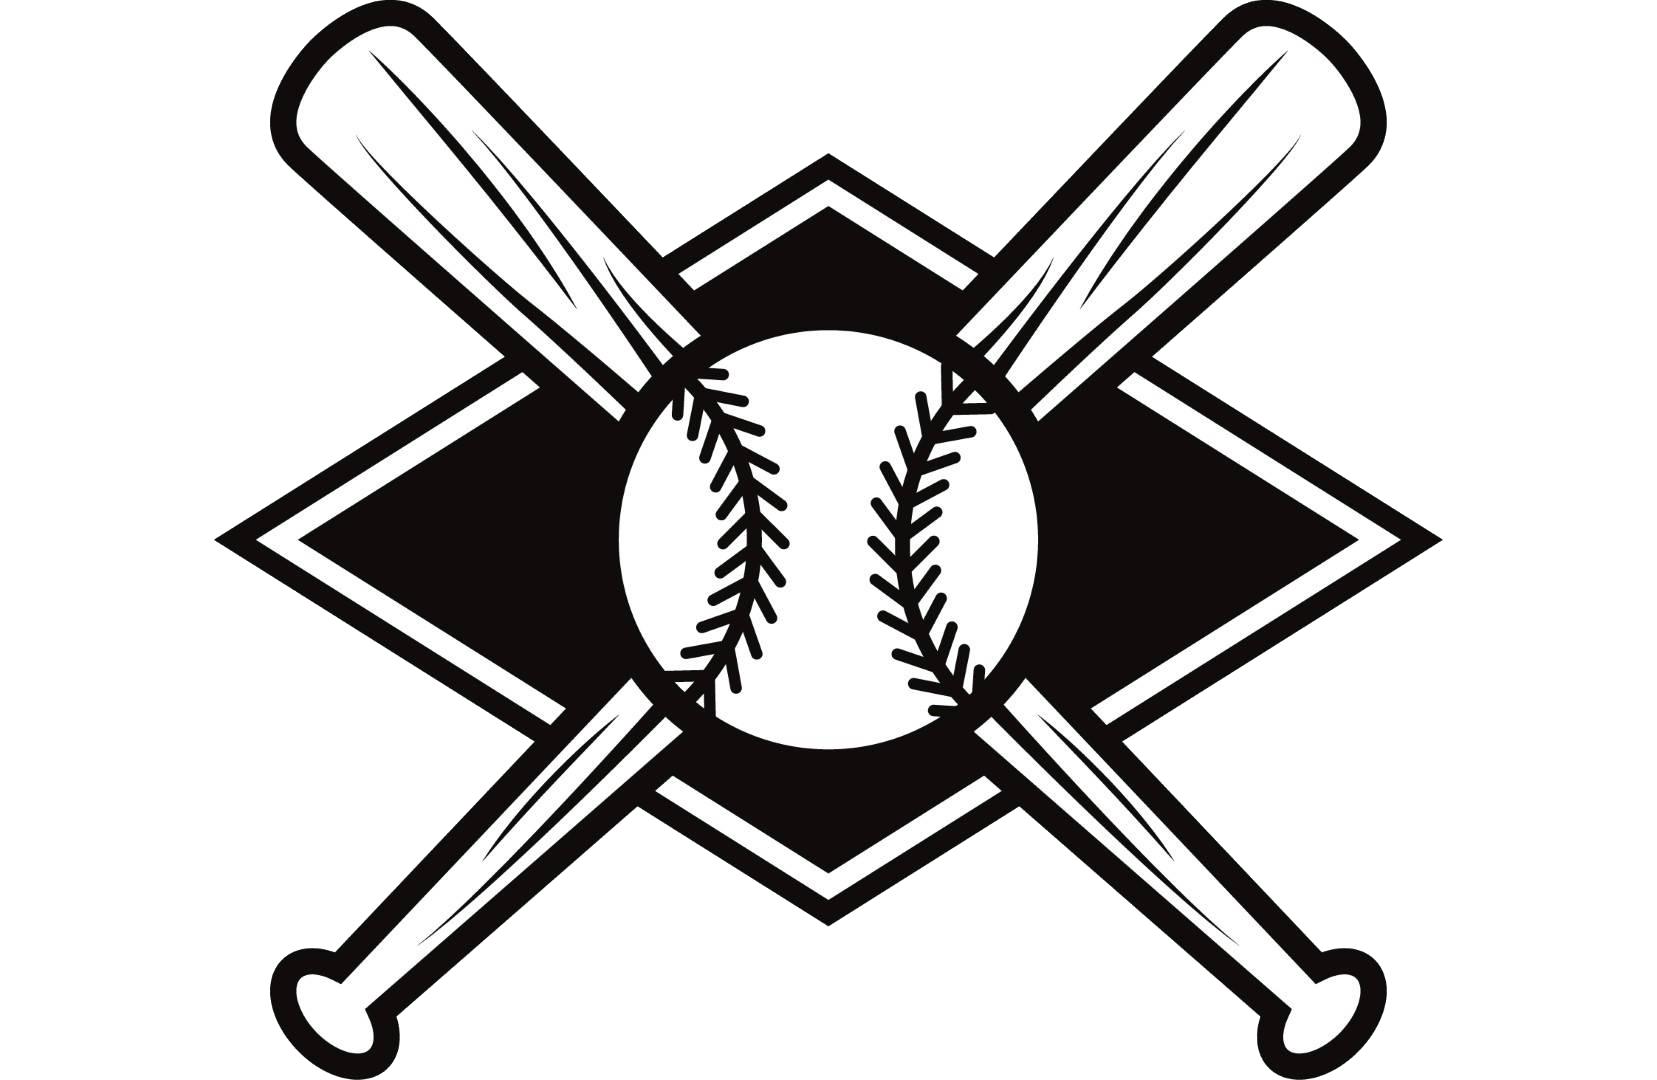 24 logo clipart banner stock Baseball Bats Batting Clip art Scalable Vector Graphics - philippine ... banner stock